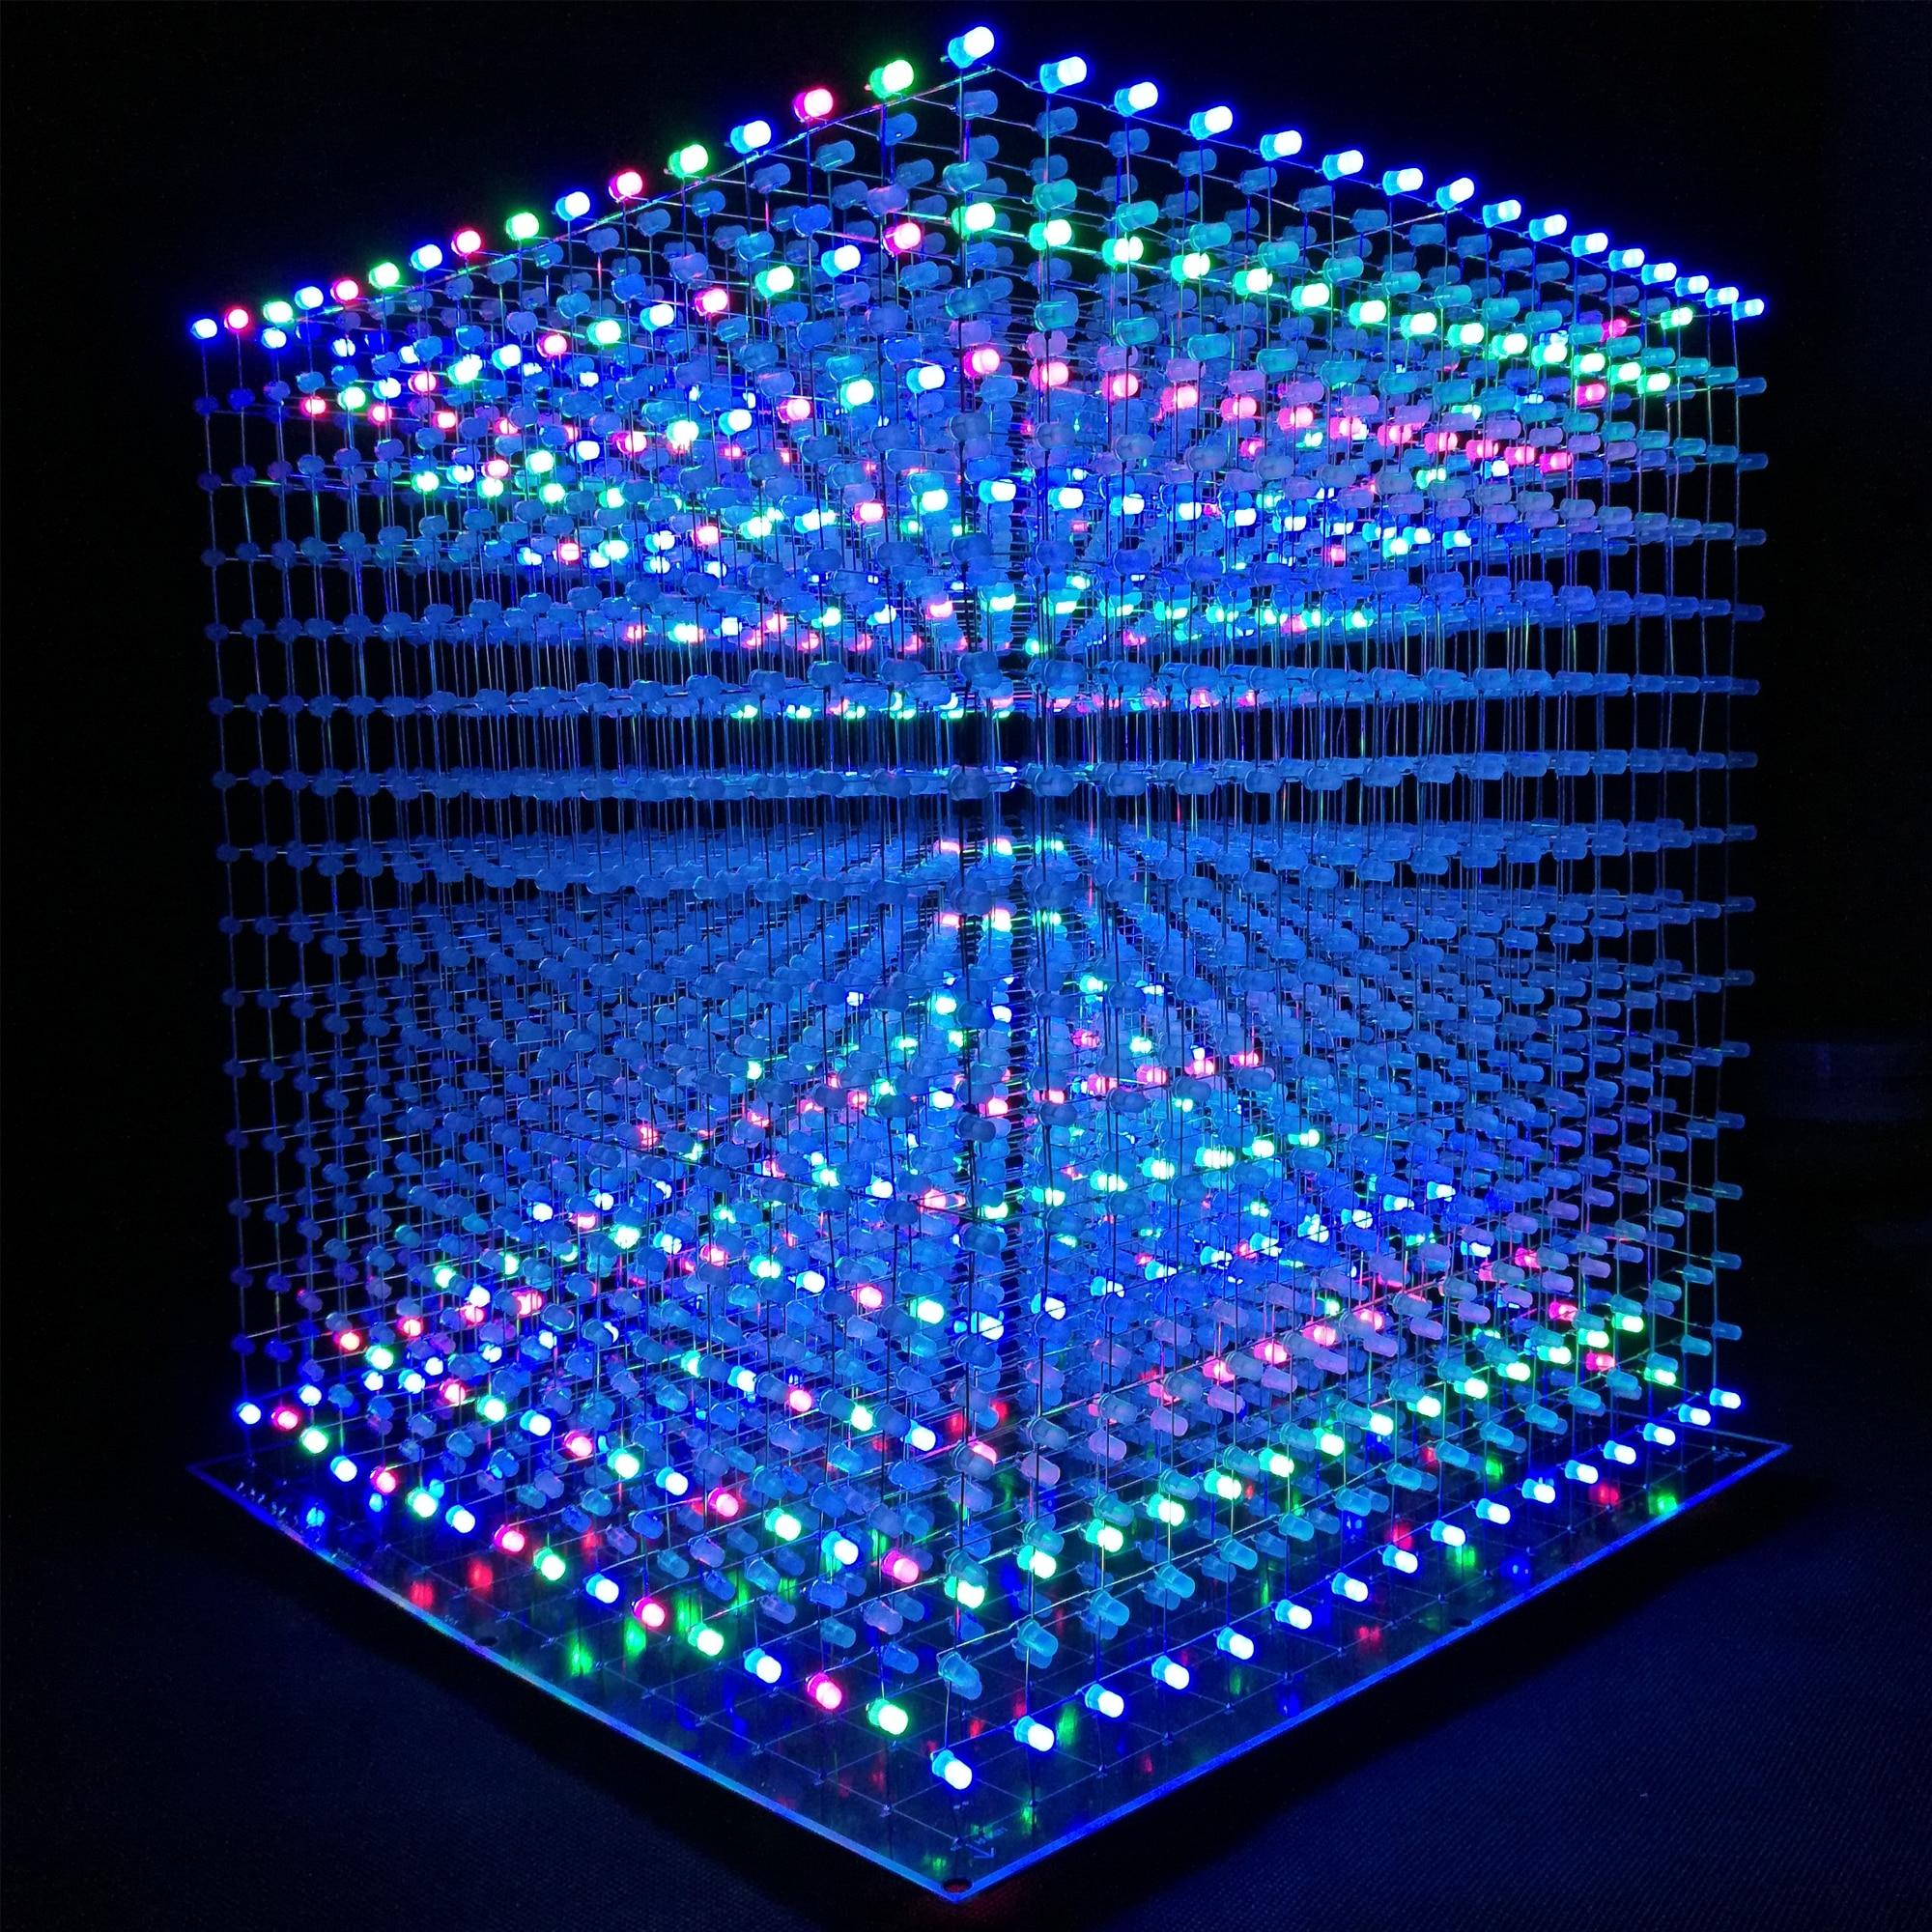 iCubeSmart 3D Led Cube Kit Diy Soldering Project 16x16x16 Led Light Cube Diy Electronic Kits Programmable Soldering Learning Kit